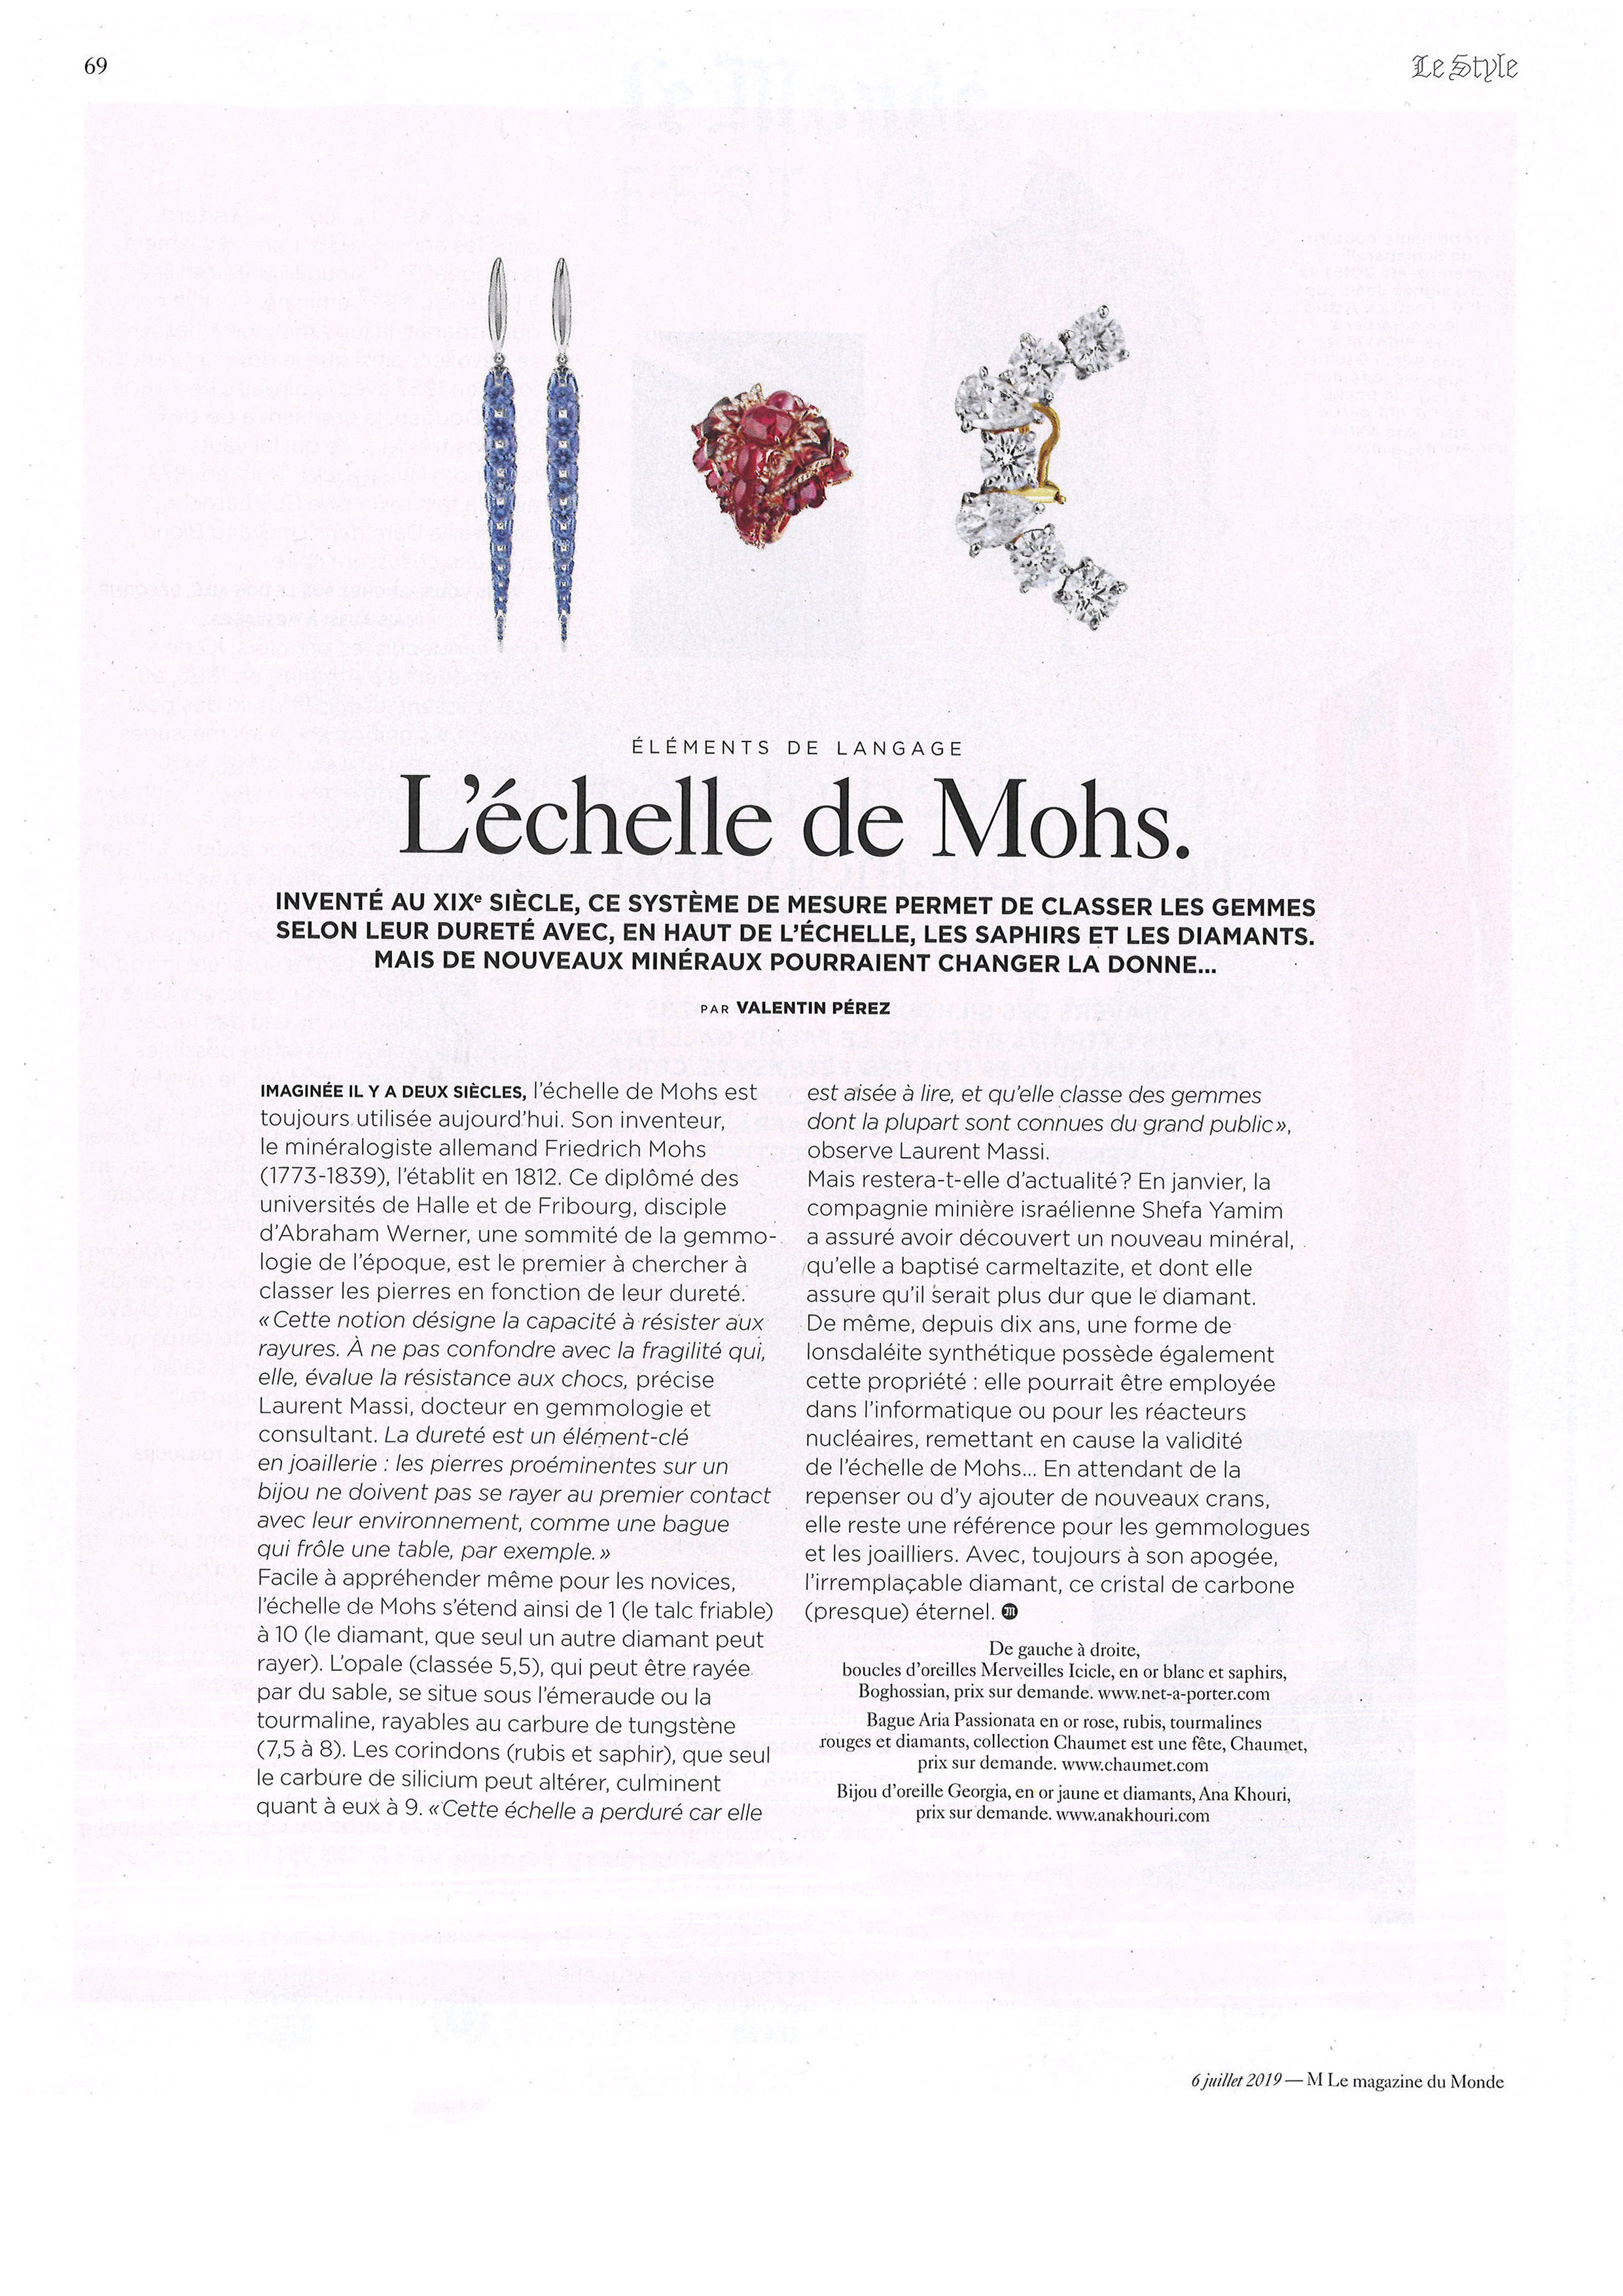 M Le Monde July 2019 Diamond Georgia Ear Piece.jpg